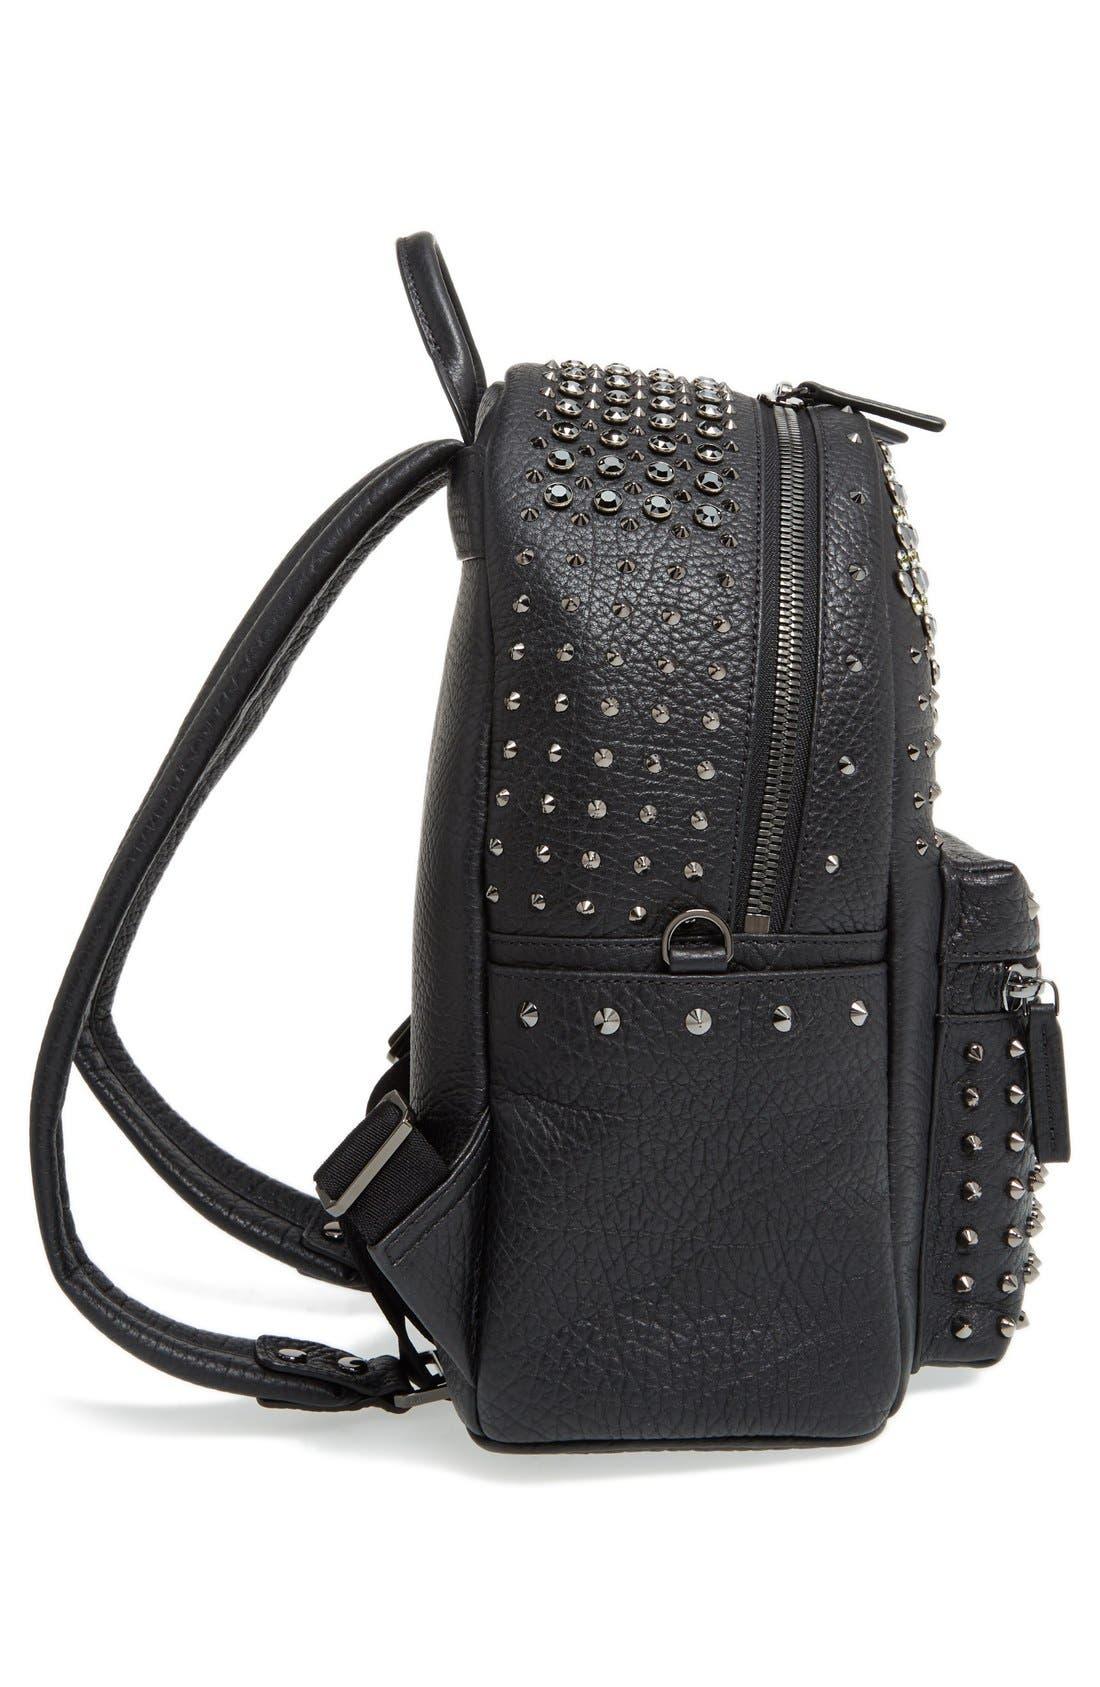 'Small Stark Special' Swarovski Crystal Embellished Leather Backpack,                             Alternate thumbnail 5, color,                             001